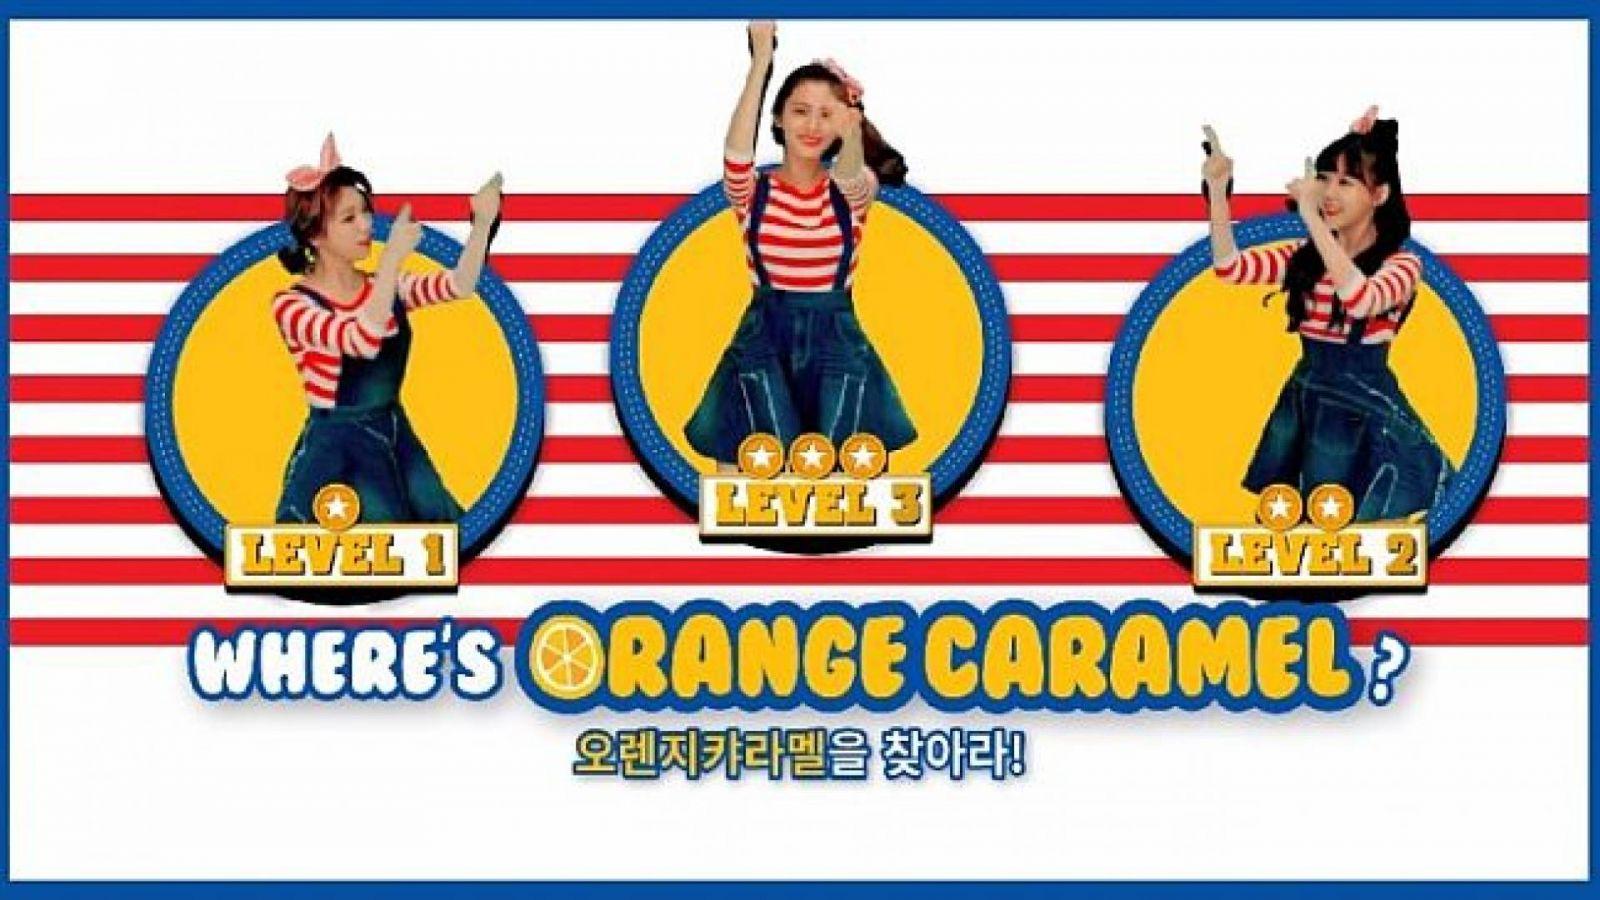 Novo single do Orange Caramel © Pledis Entertainment